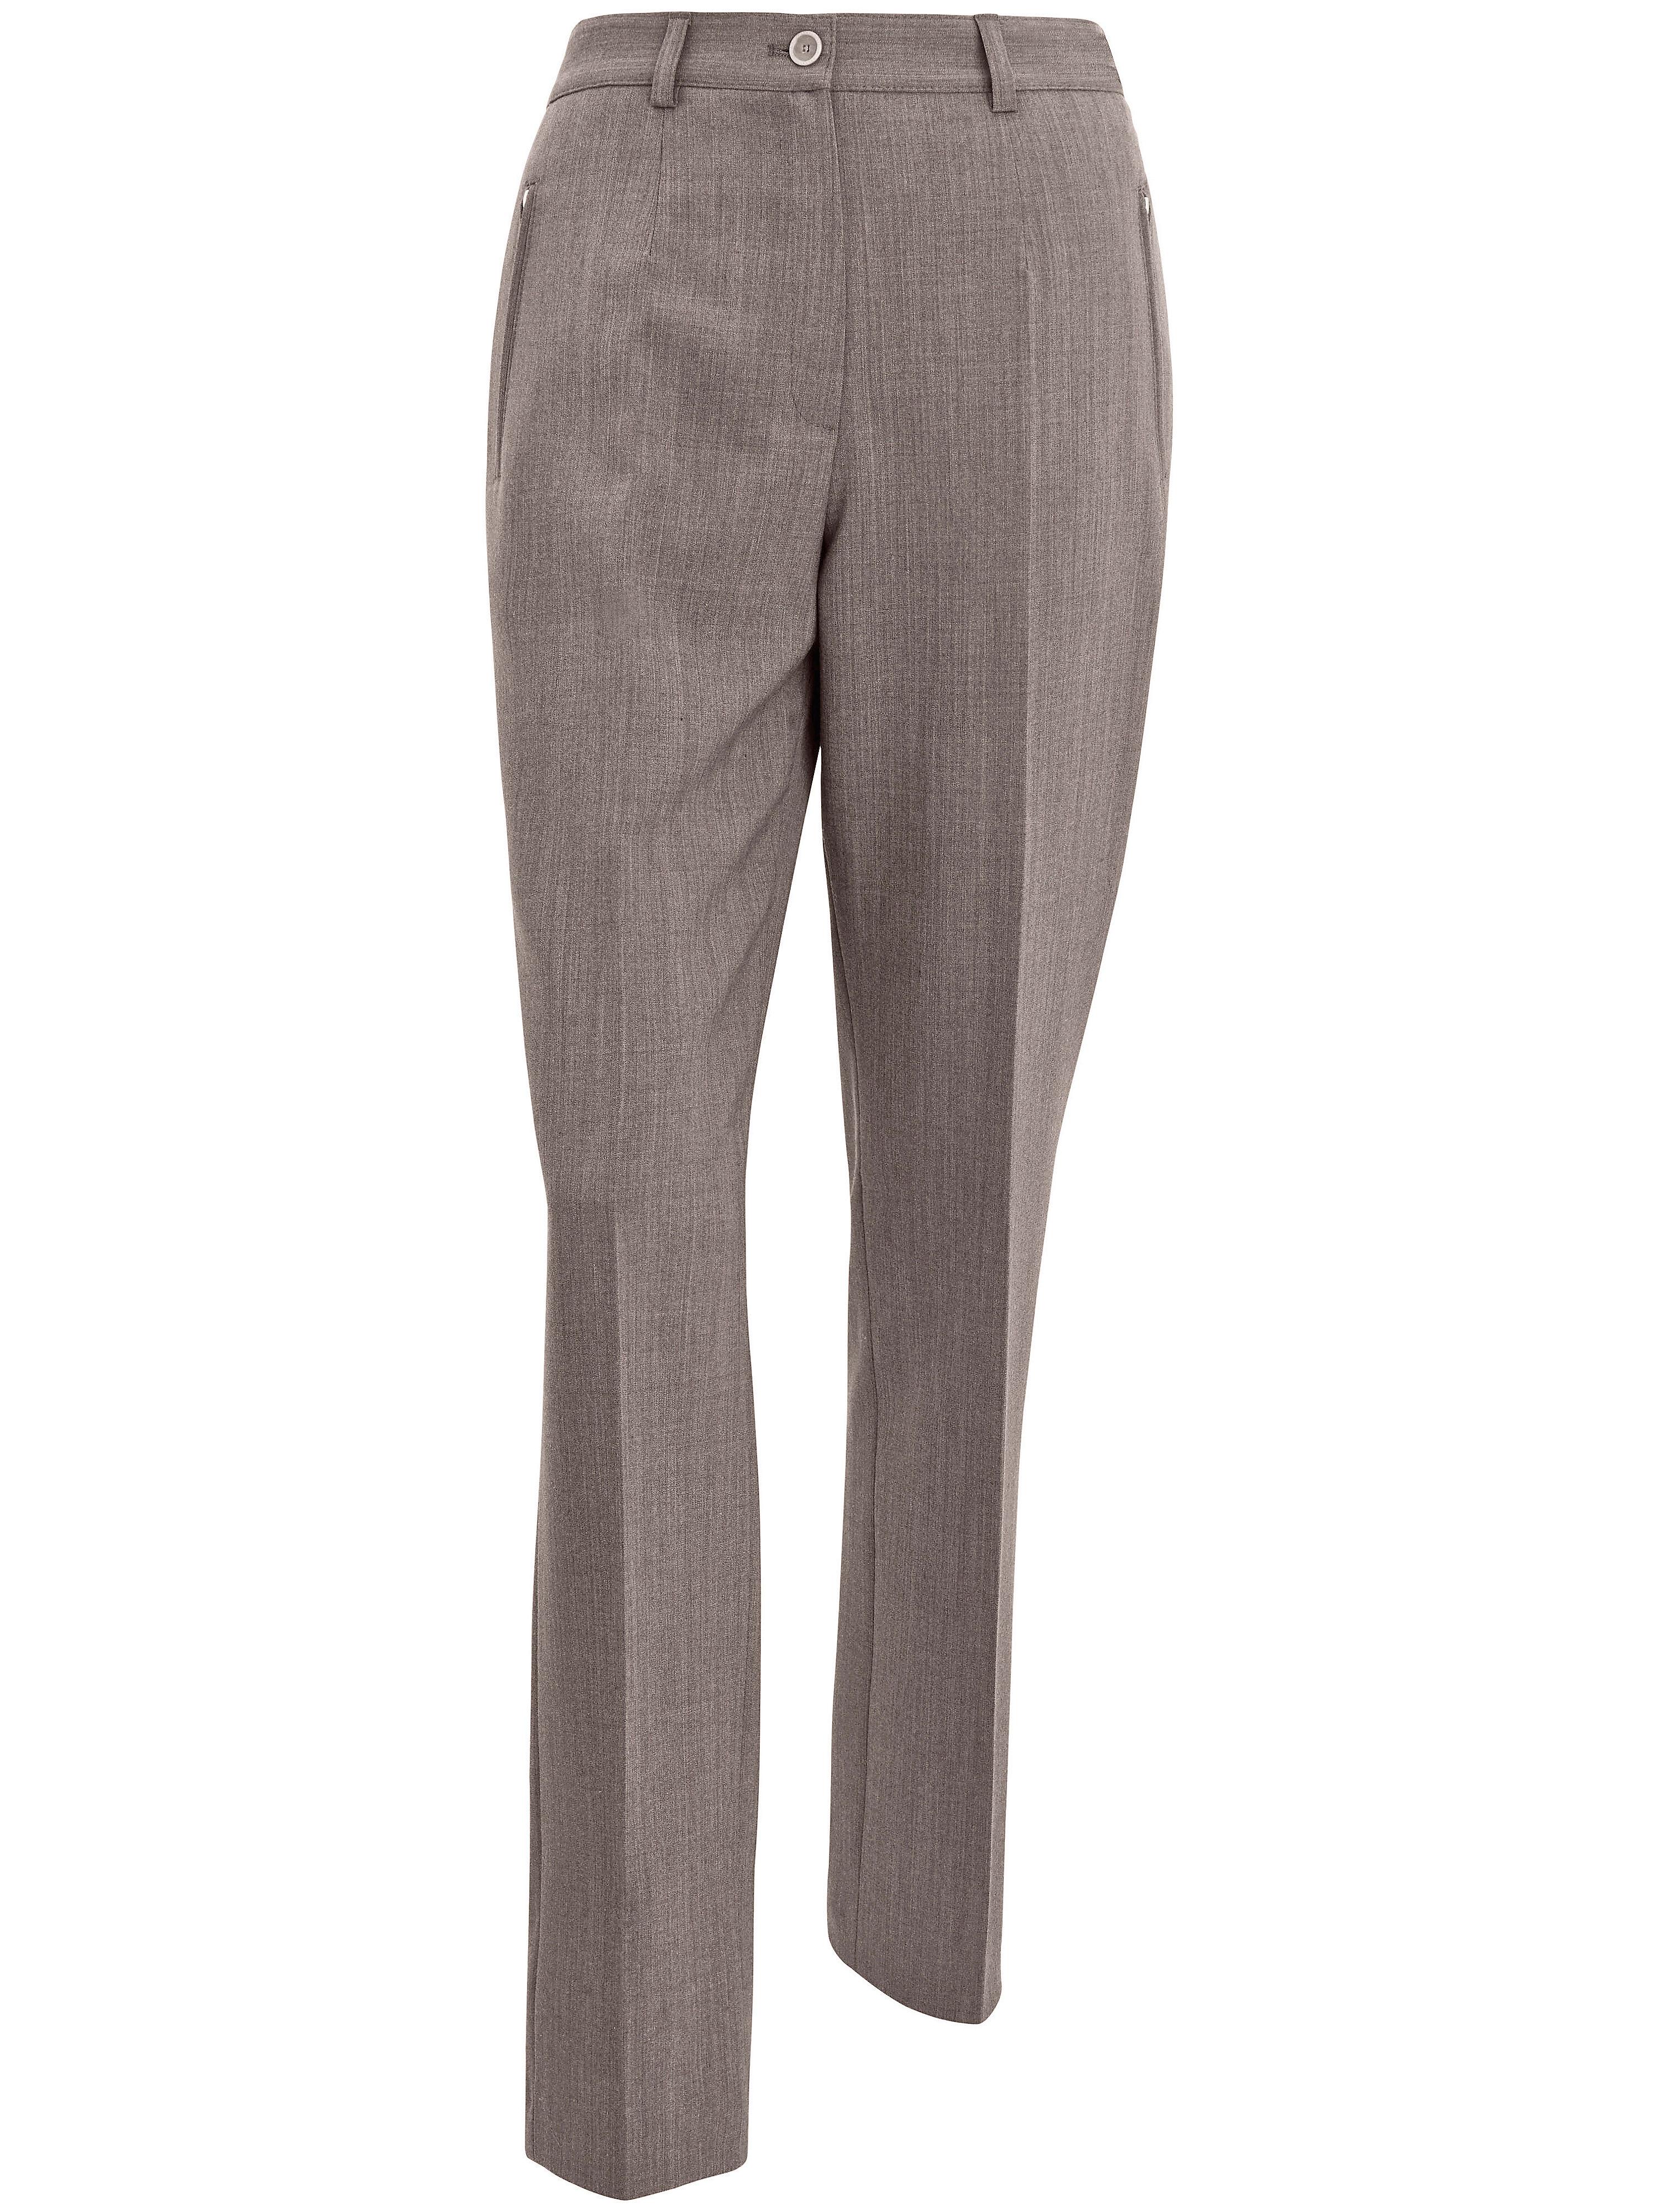 Le pantalon voyage RAMONA Pro Form Slim  Raphaela by Brax beige taille 24